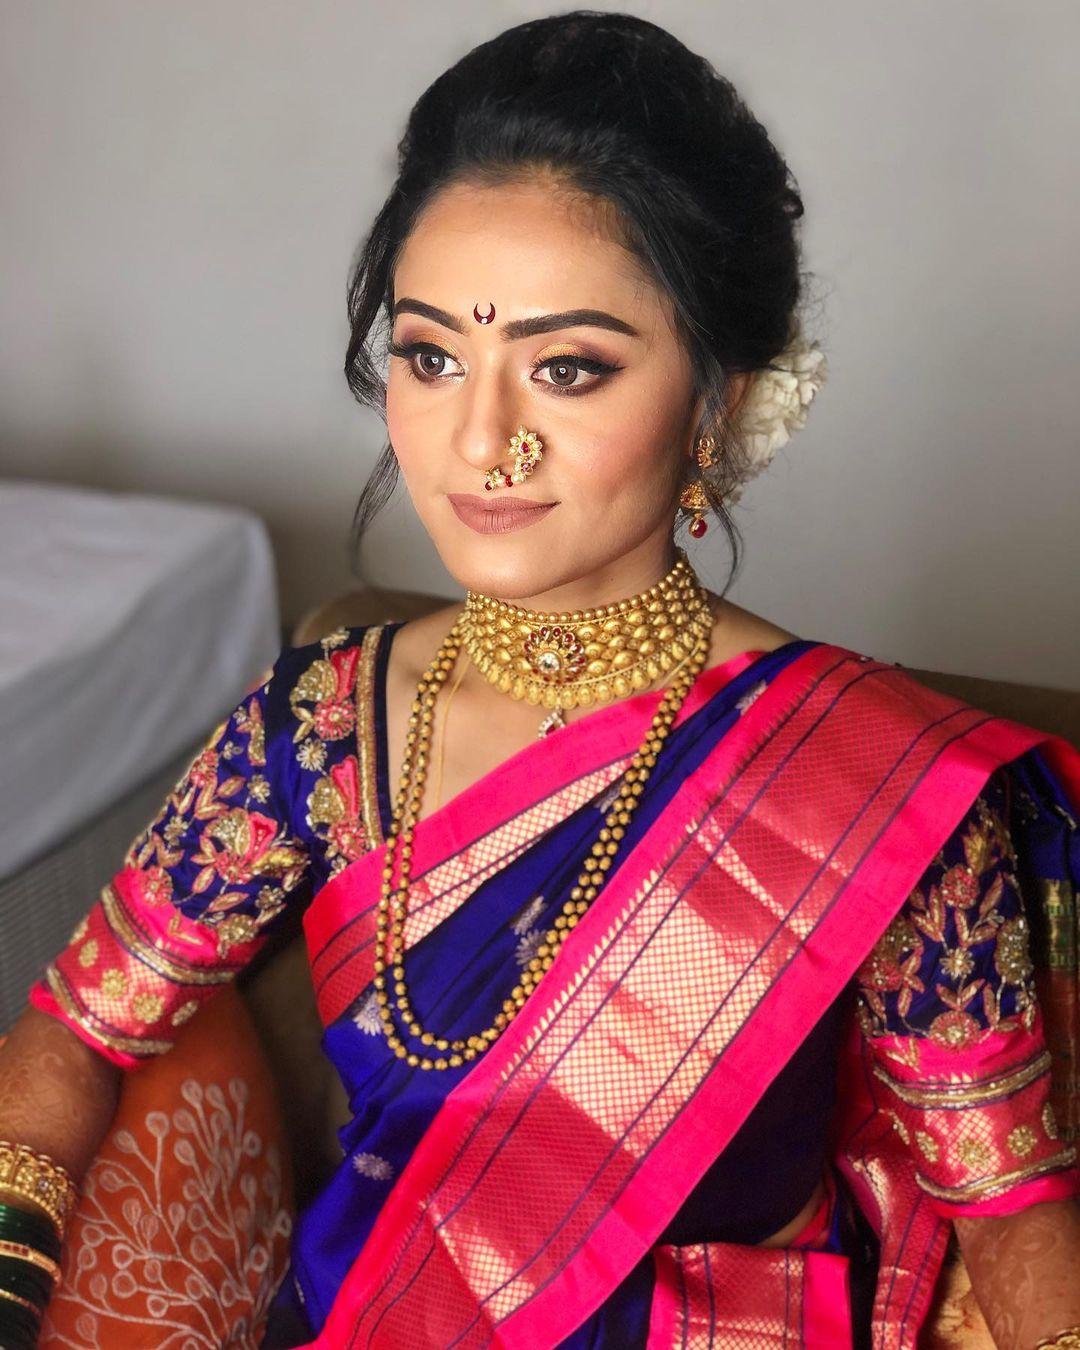 Royal Maharashtrian Bridal Makeup By Tejawini Makeup Artist Pune-1